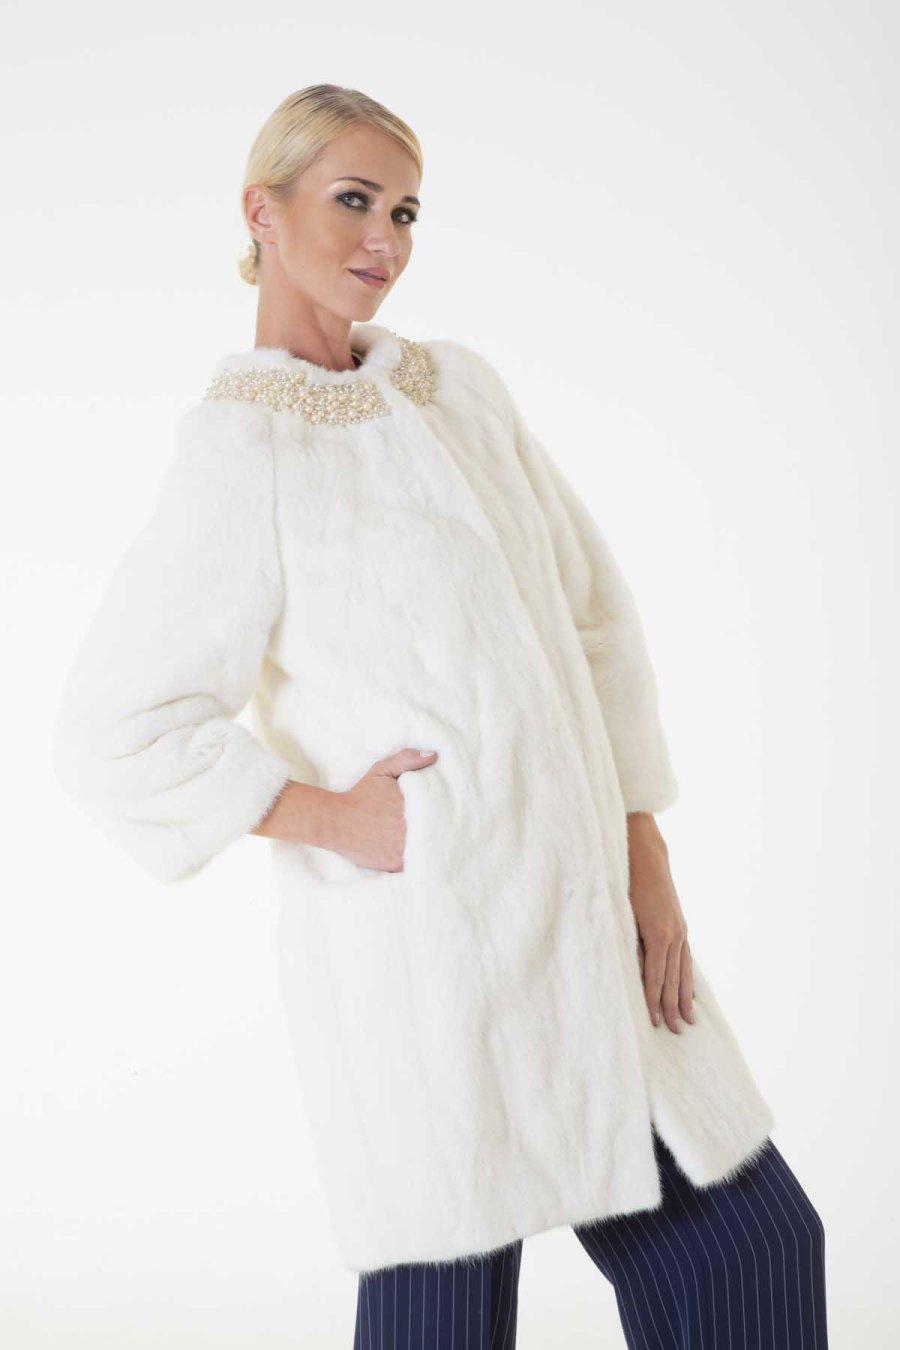 Pearl Male Mink Jacket | Пальто из меха норки жемчужного цвета - Sarigianni Furs